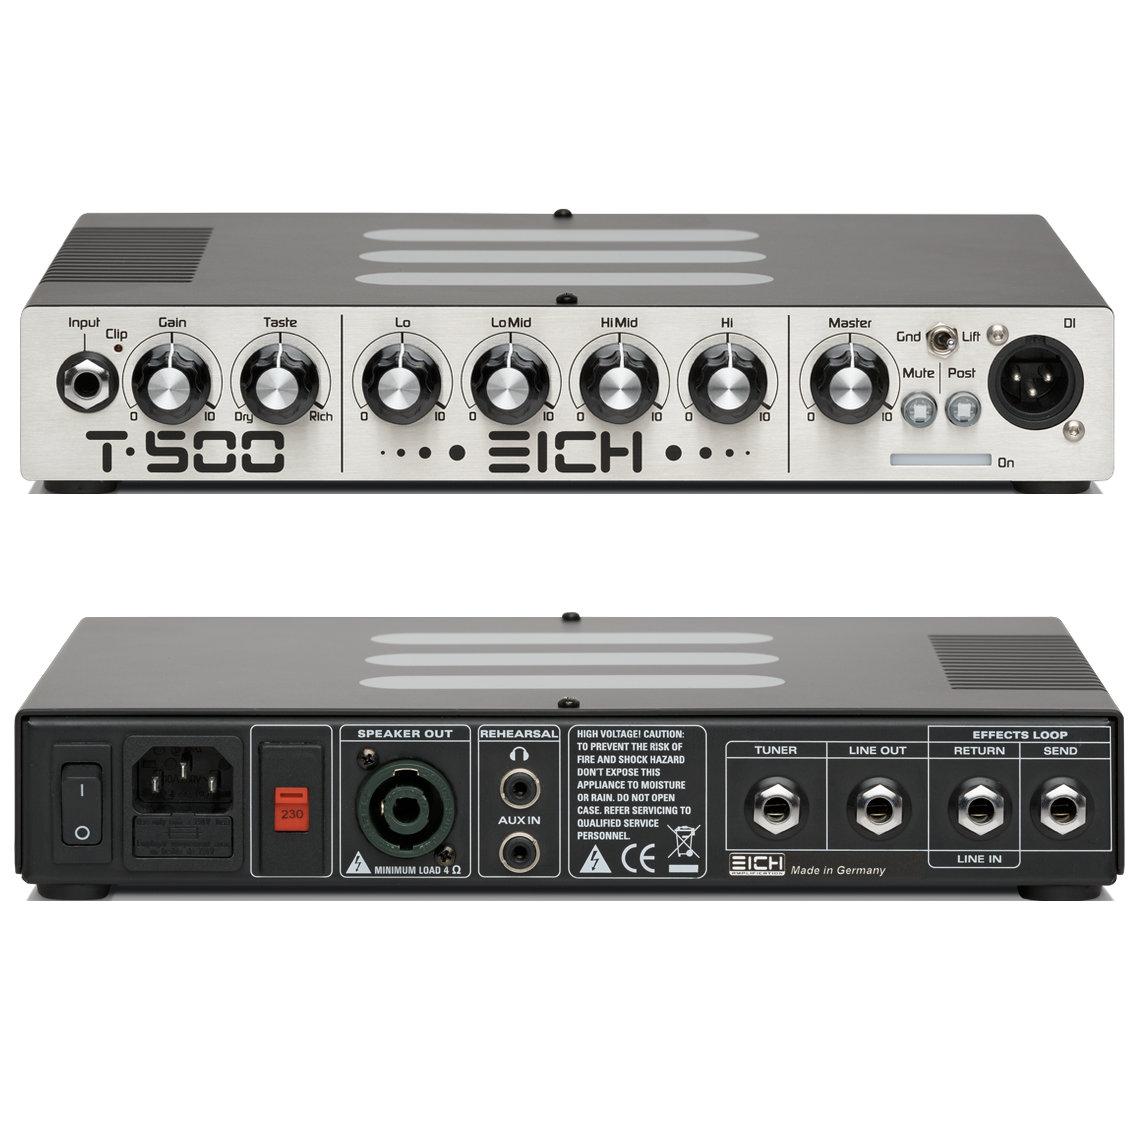 eich-amplification-t-500-bass-amp-1